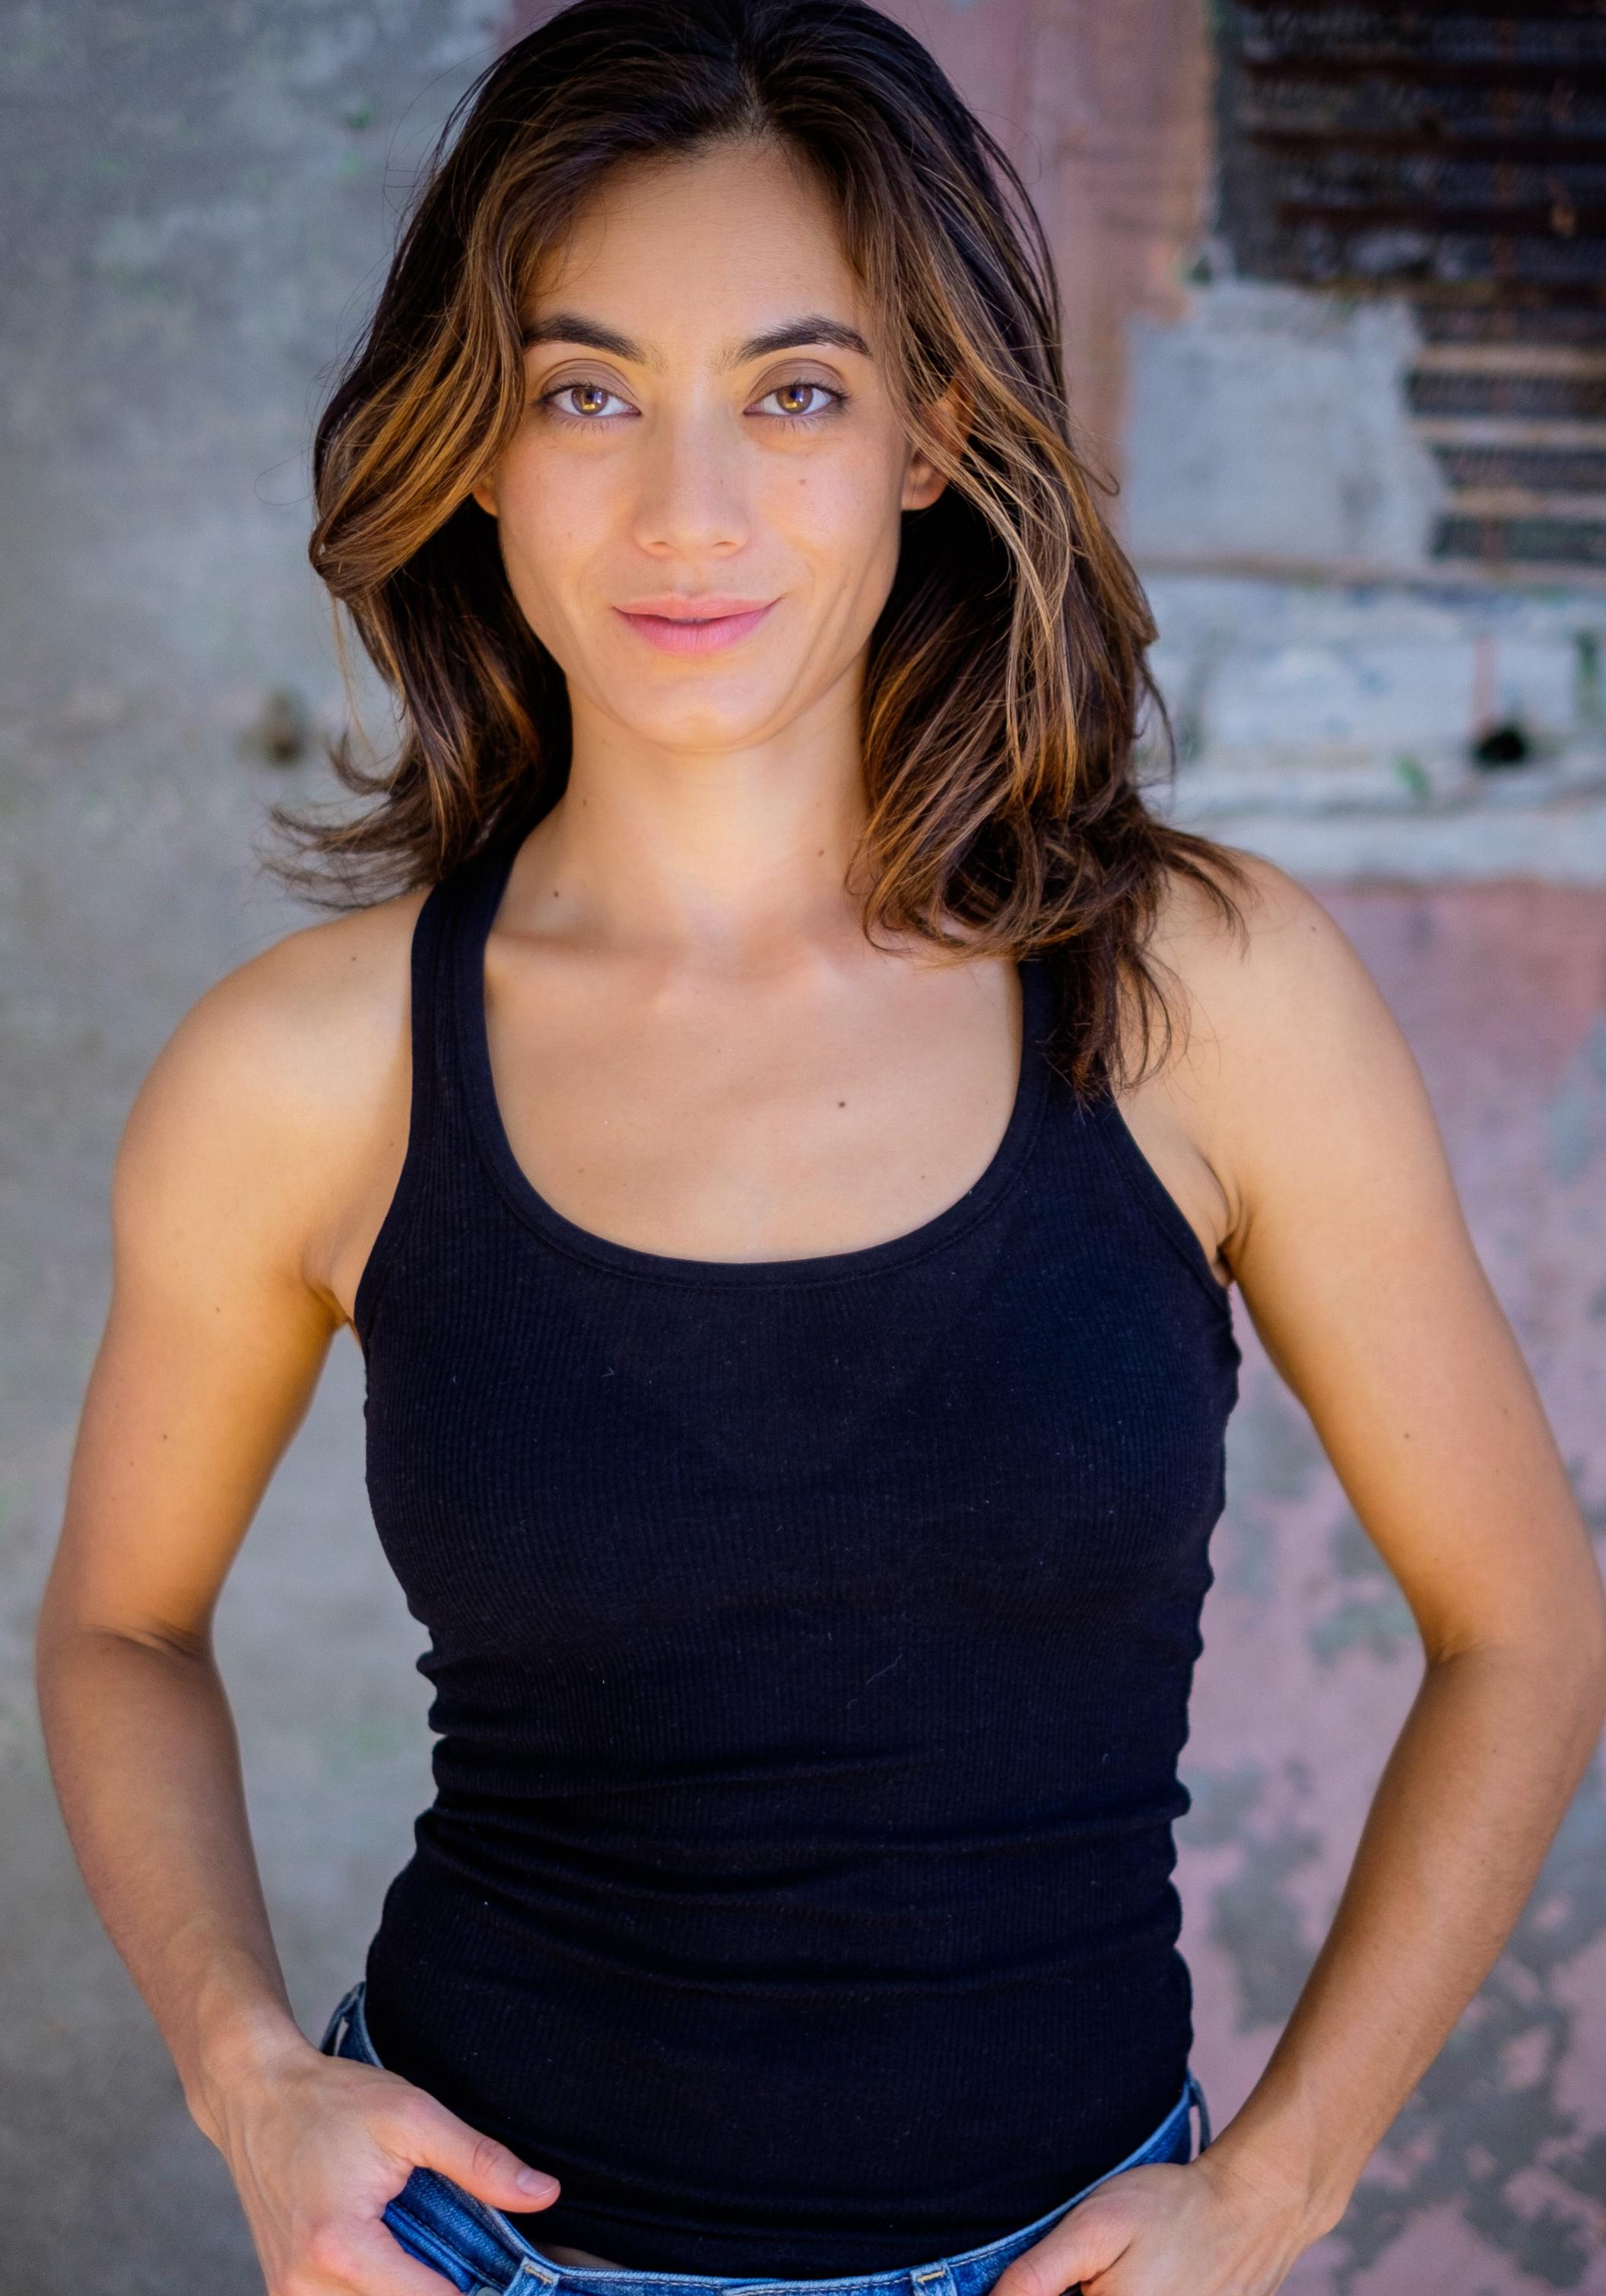 Angelica Kushi